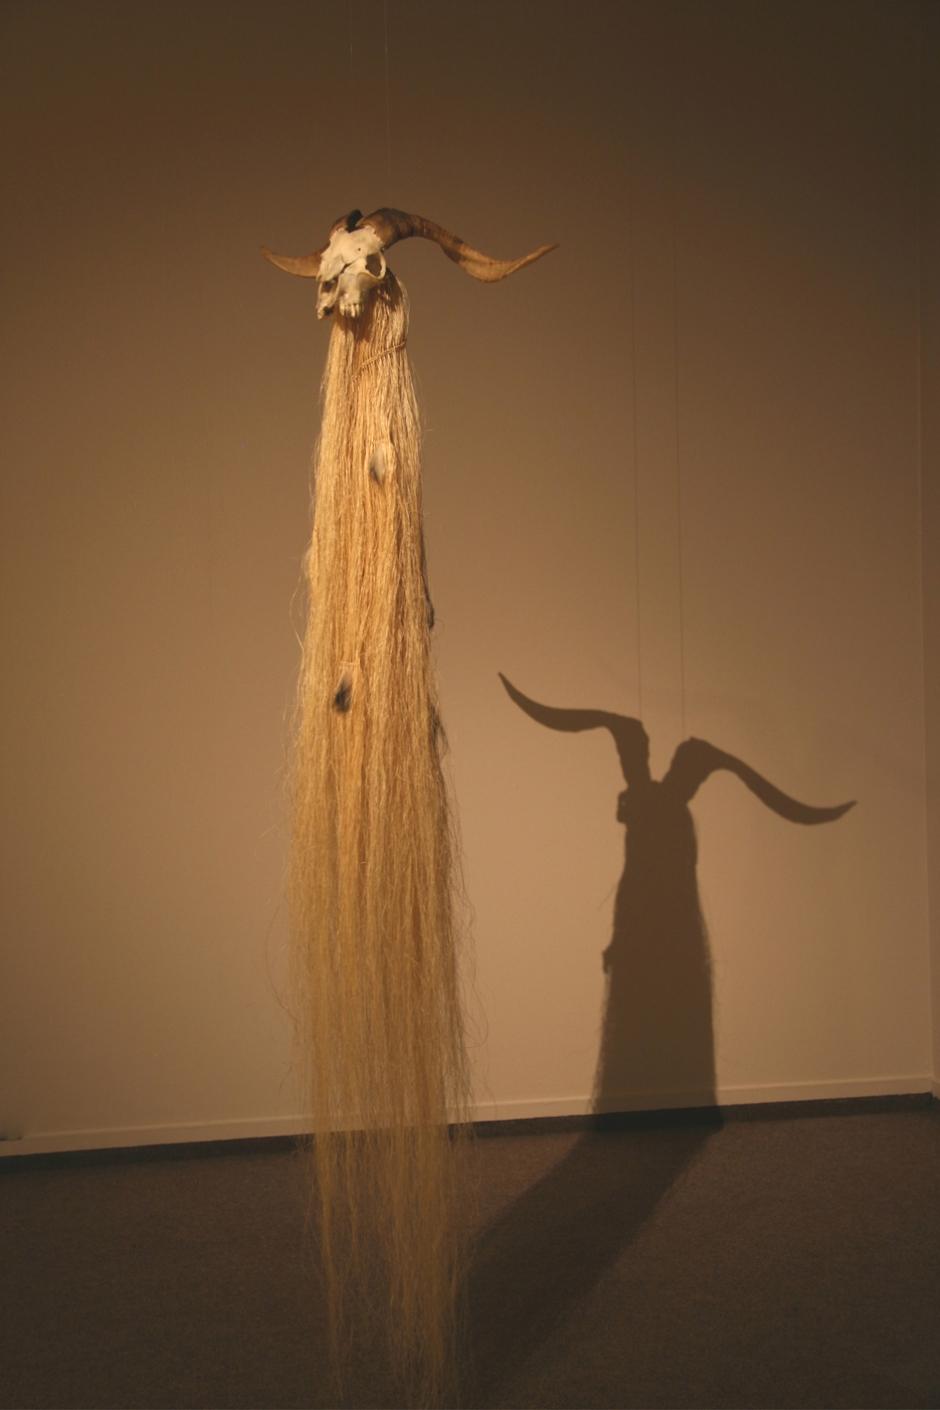 43. Goat